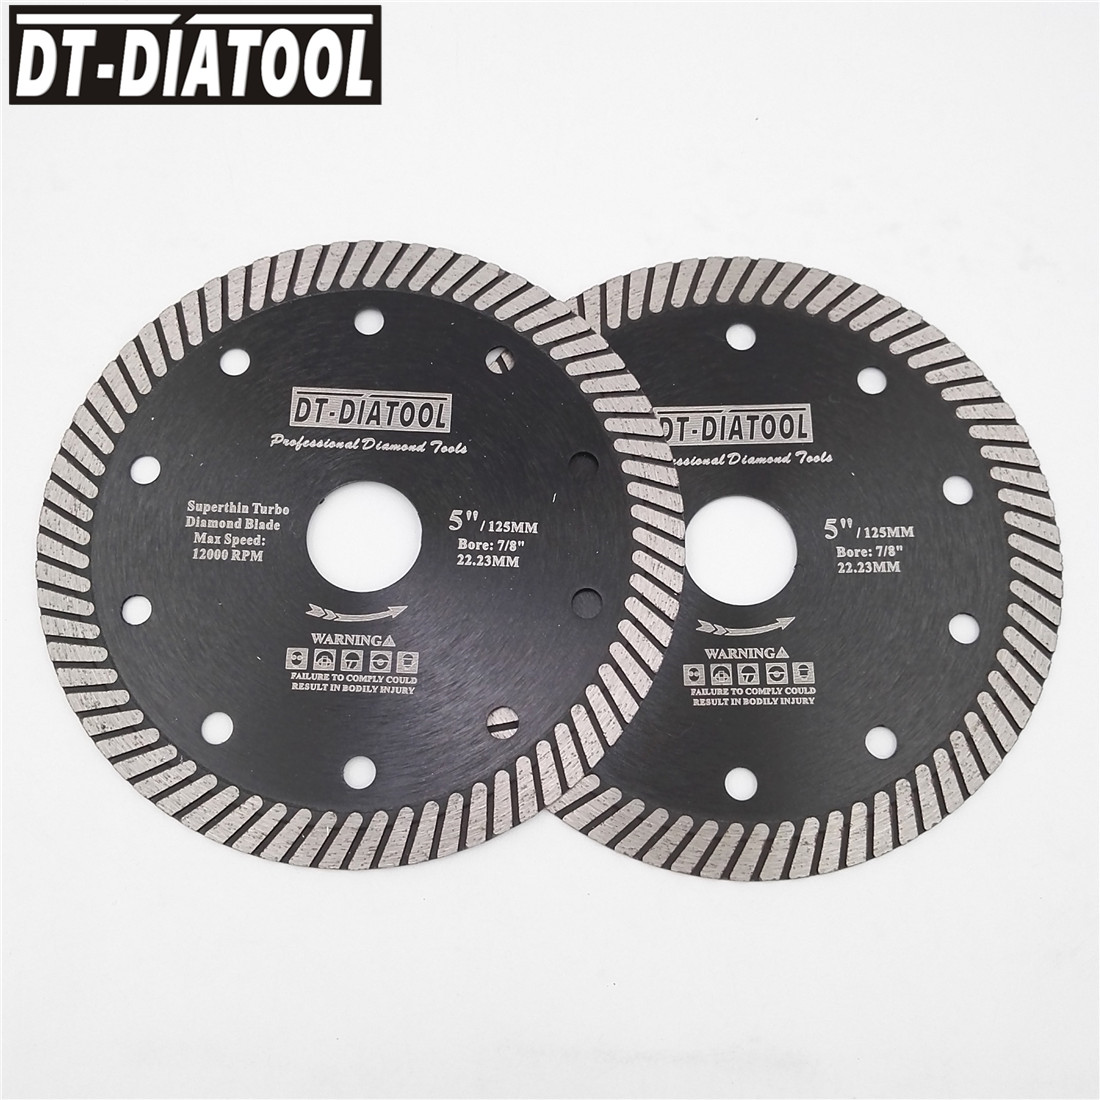 DT-DIATOOL 2pcs Hot Pressed Turbo Diameter 125MM Superthin Diamond Cutting Saw Blades For Ceramic Tile Marble Granite 5inches